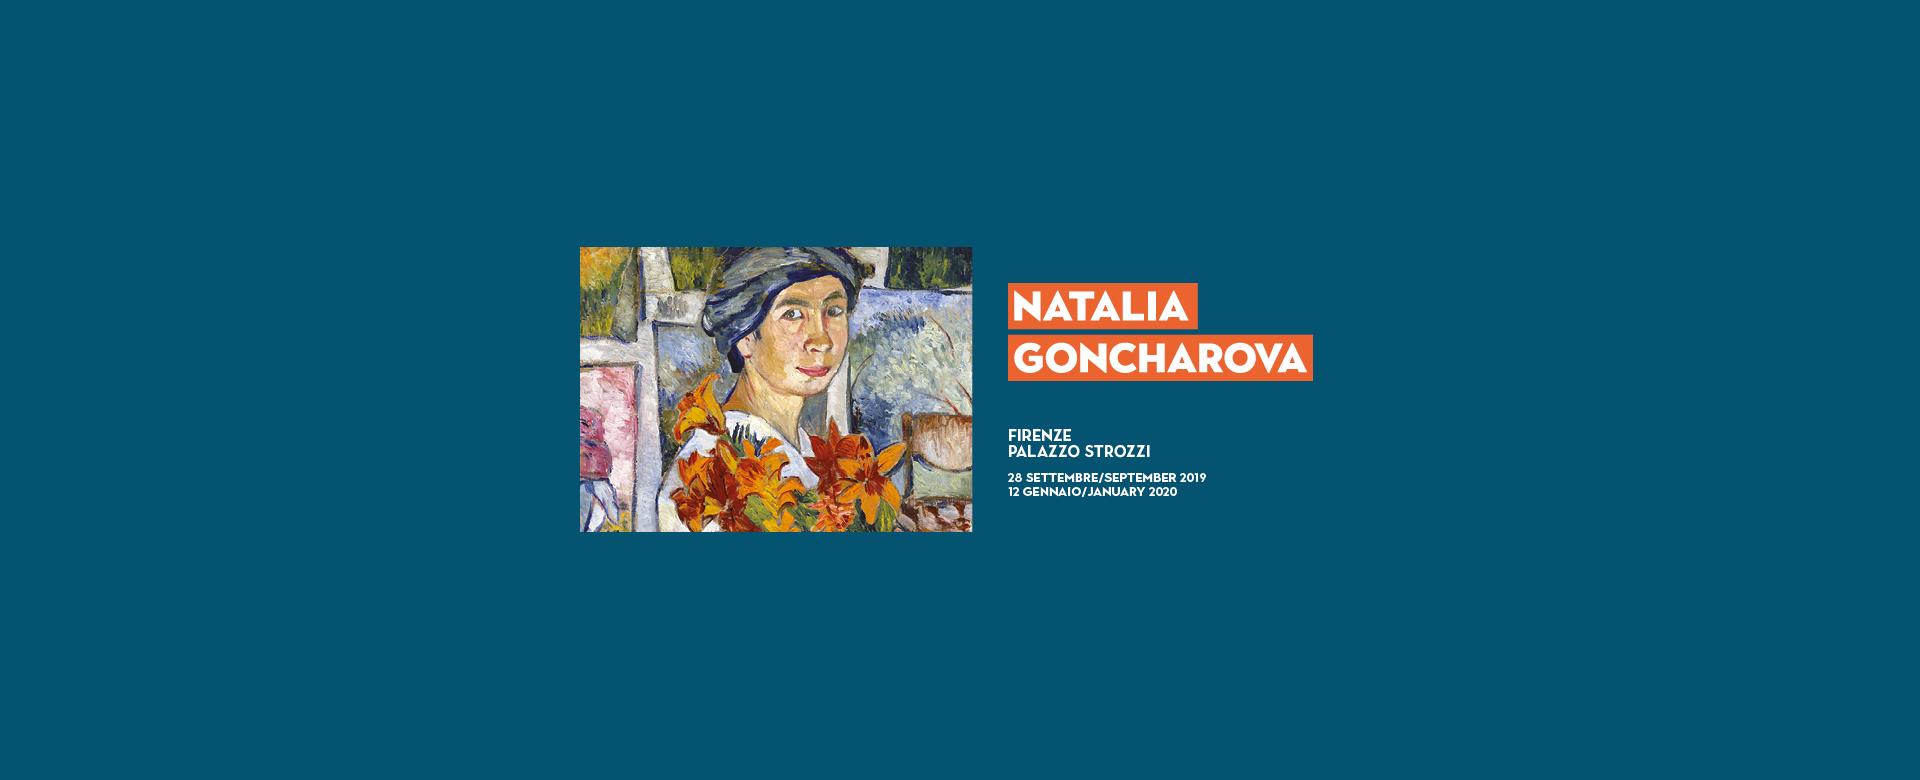 Natalia Goncharova exhibition at Palazzo Strozzi